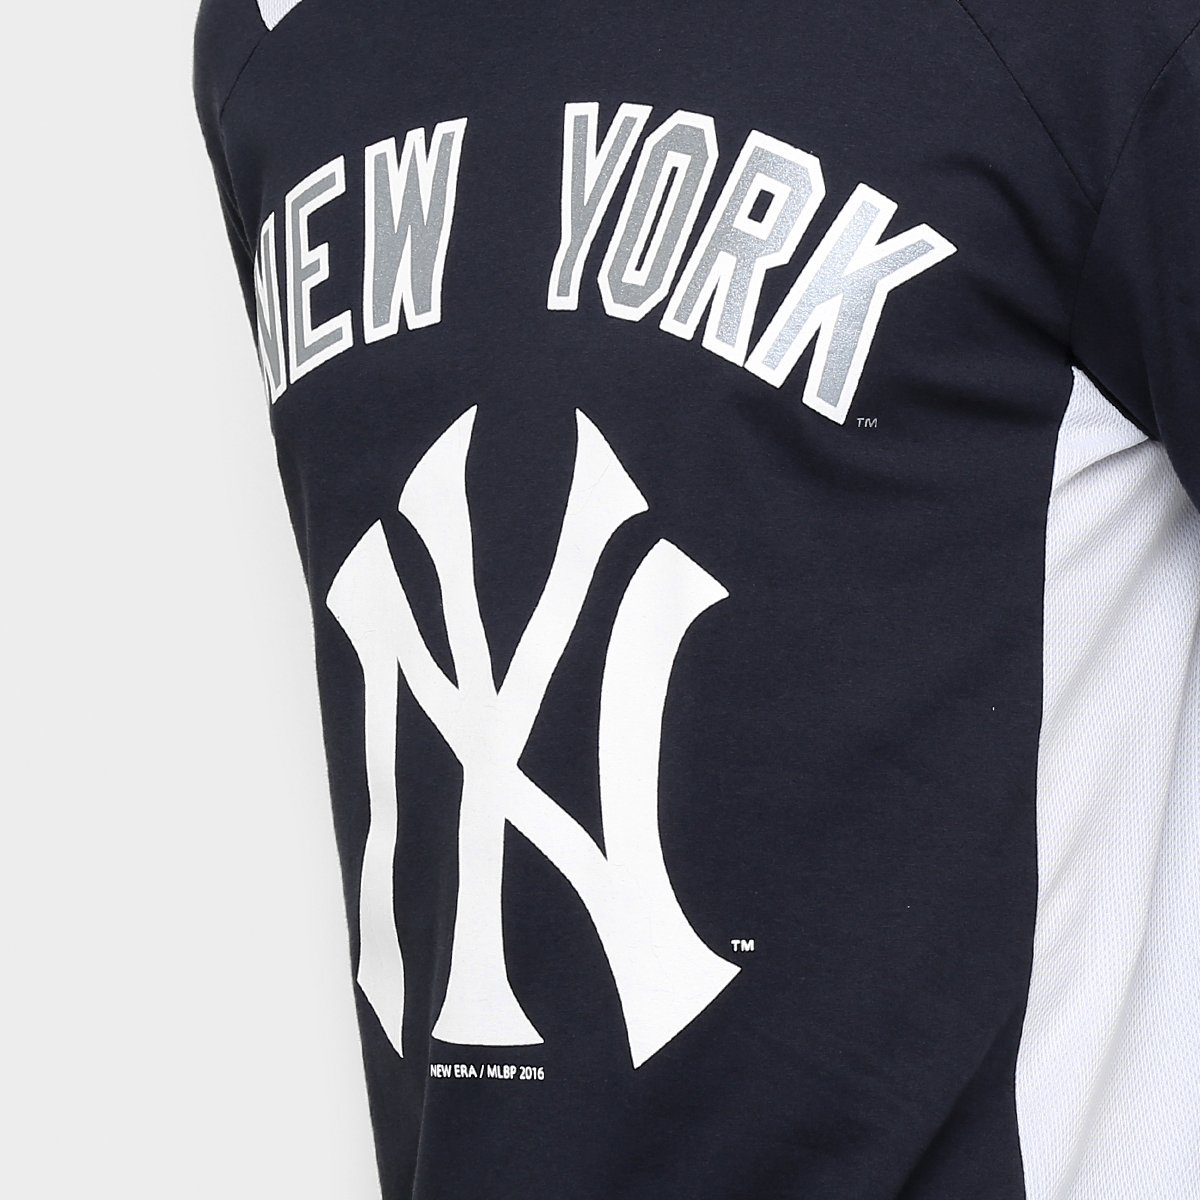 Camiseta New Era MLB Nac V 17 New York Yankees - Compre Agora  d2321afa7c3